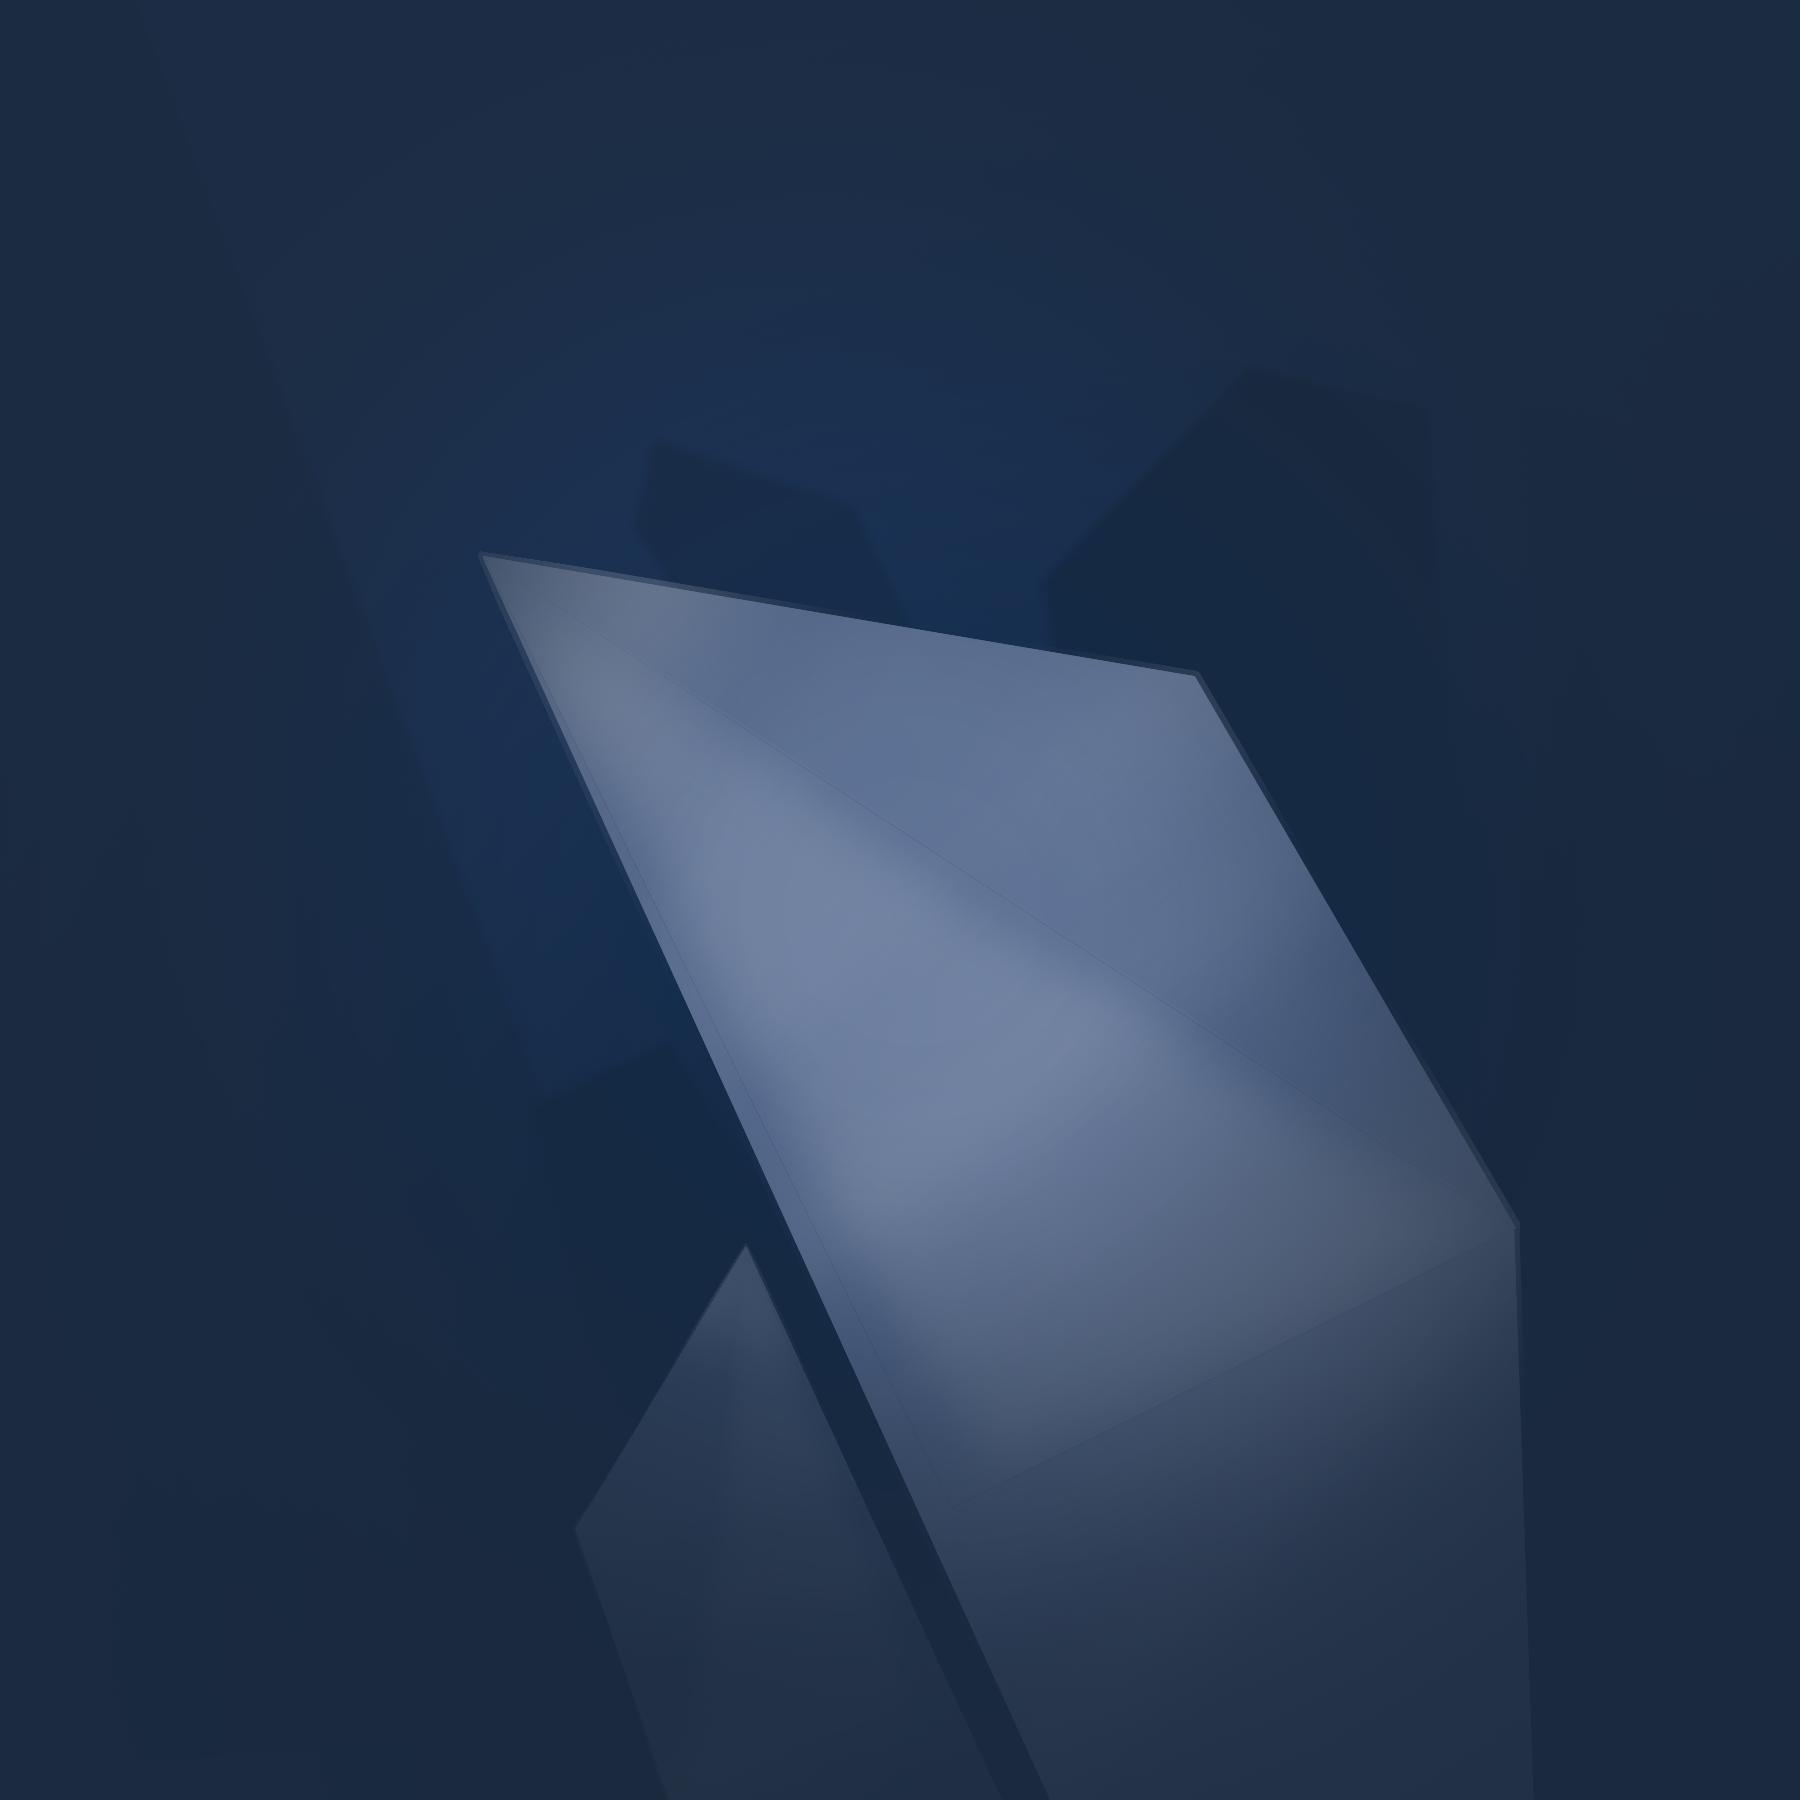 UWABIS_Downshot1